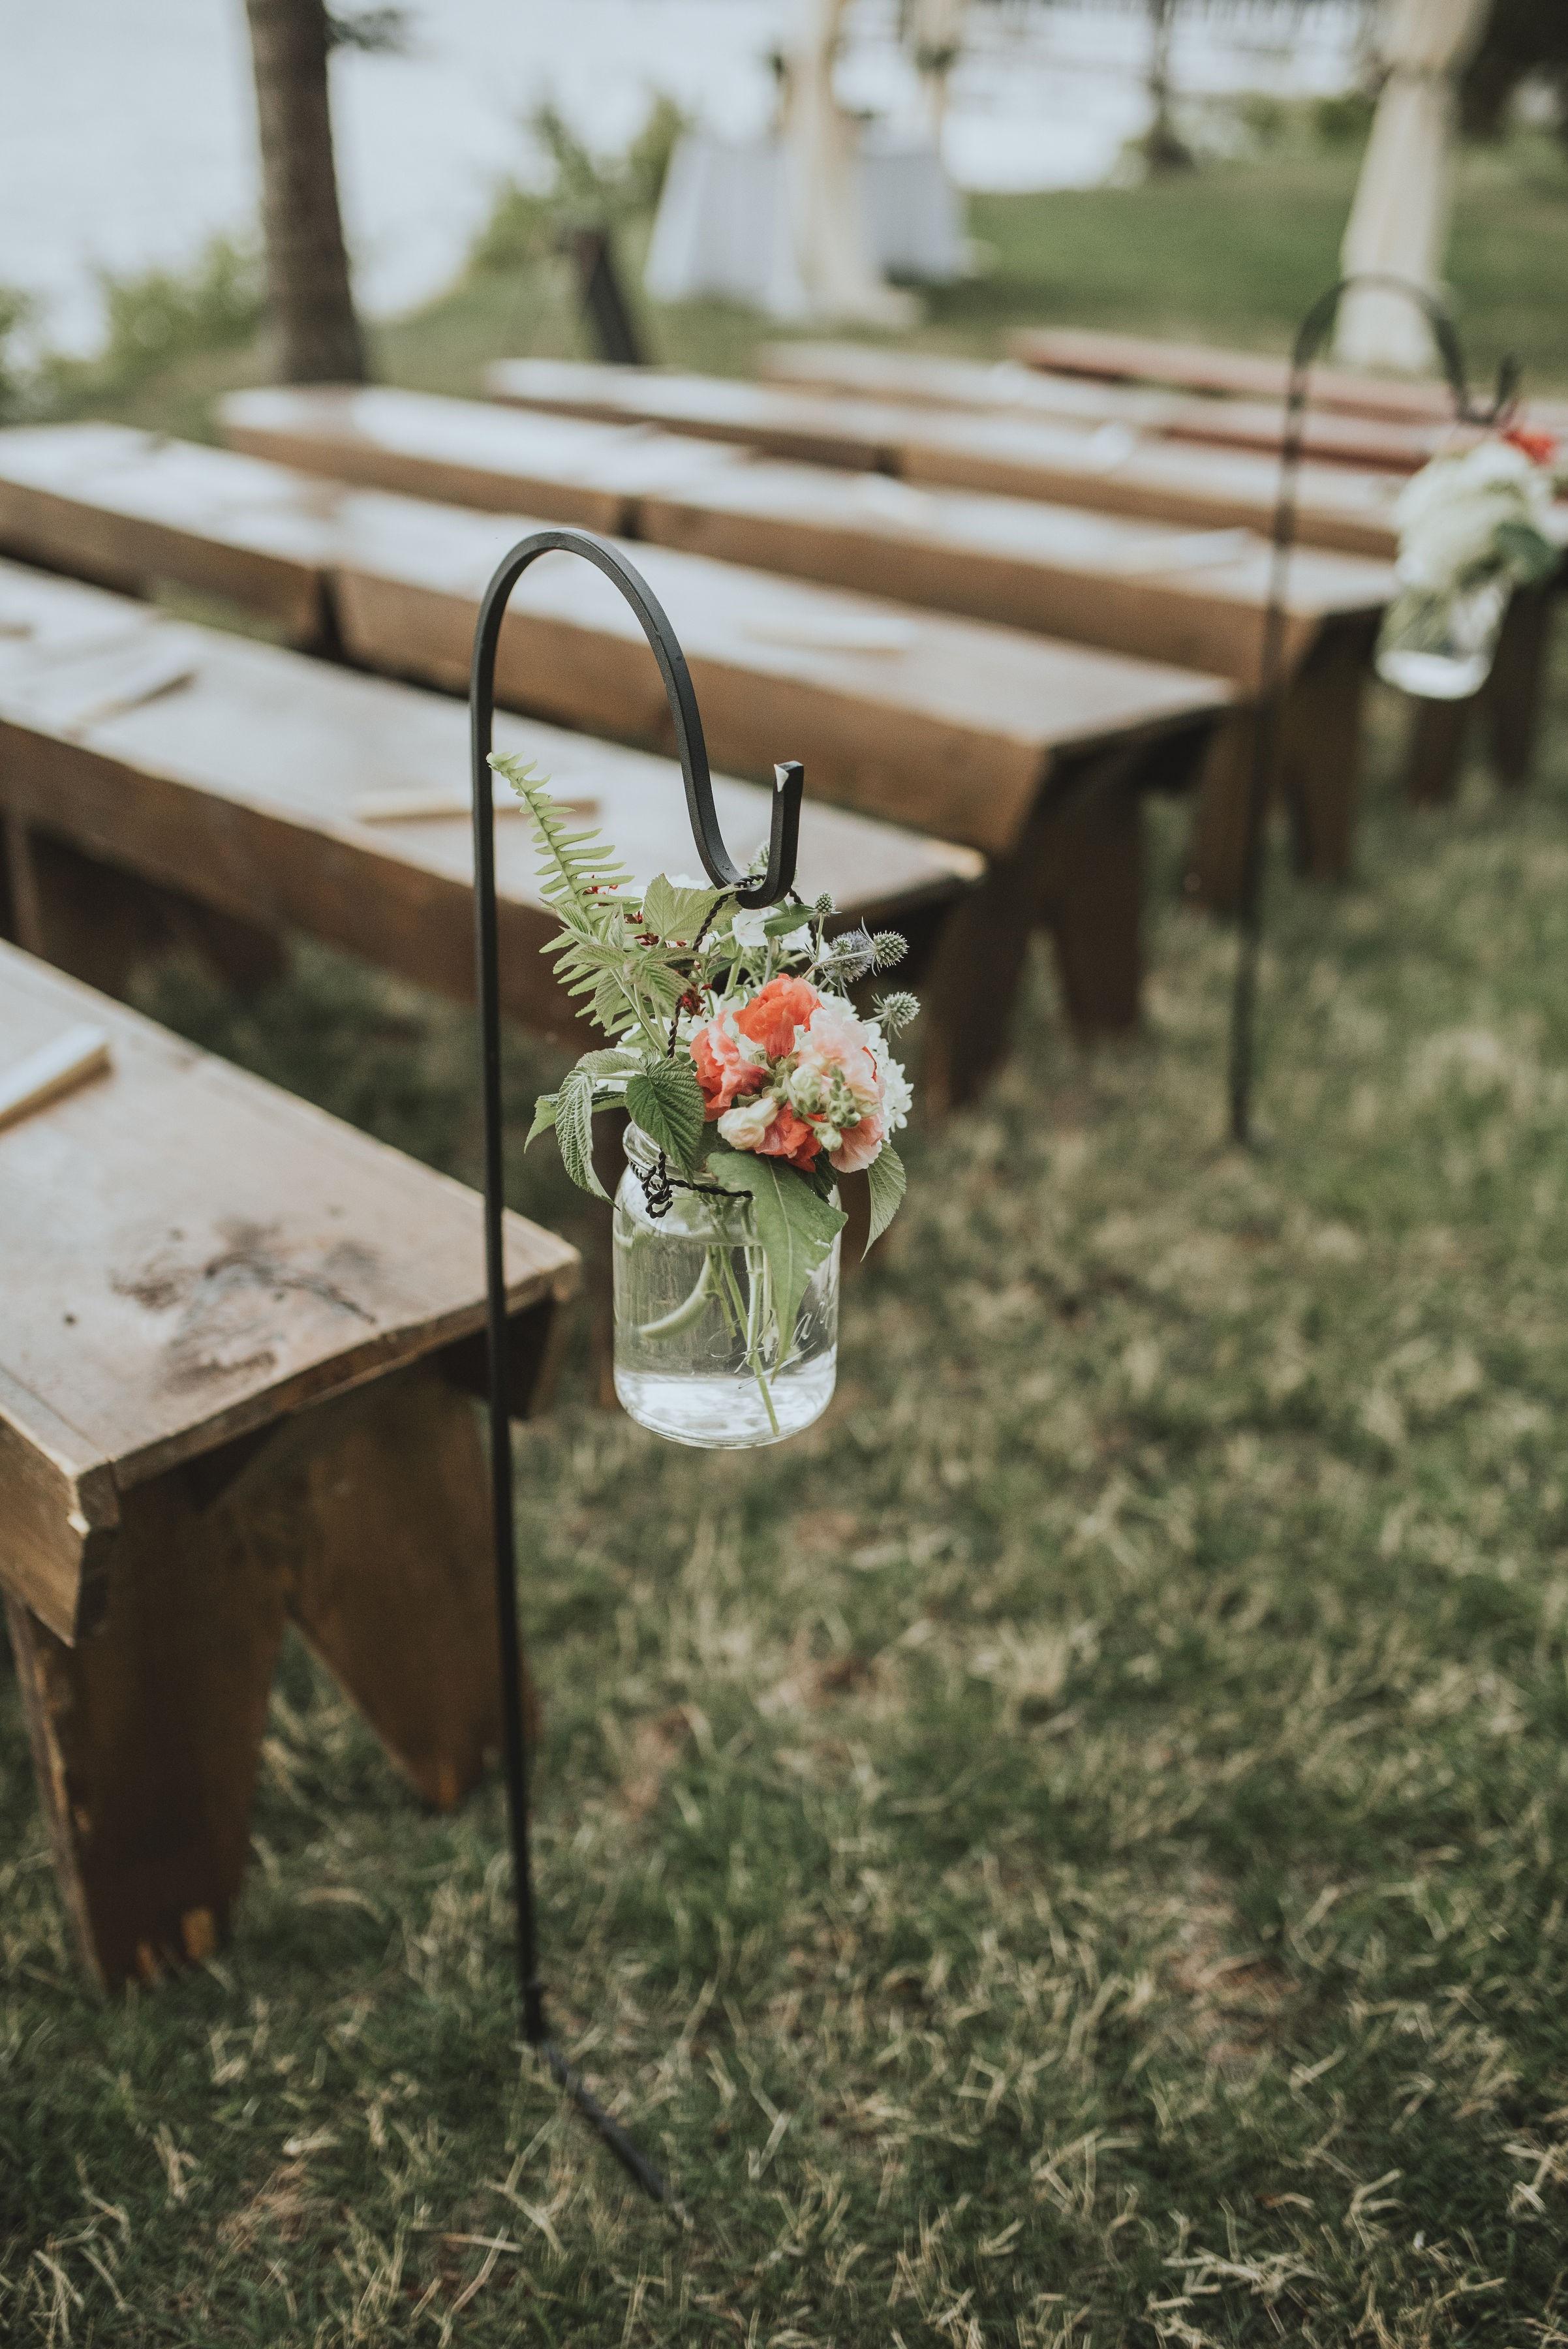 Hanging ceremony flowers